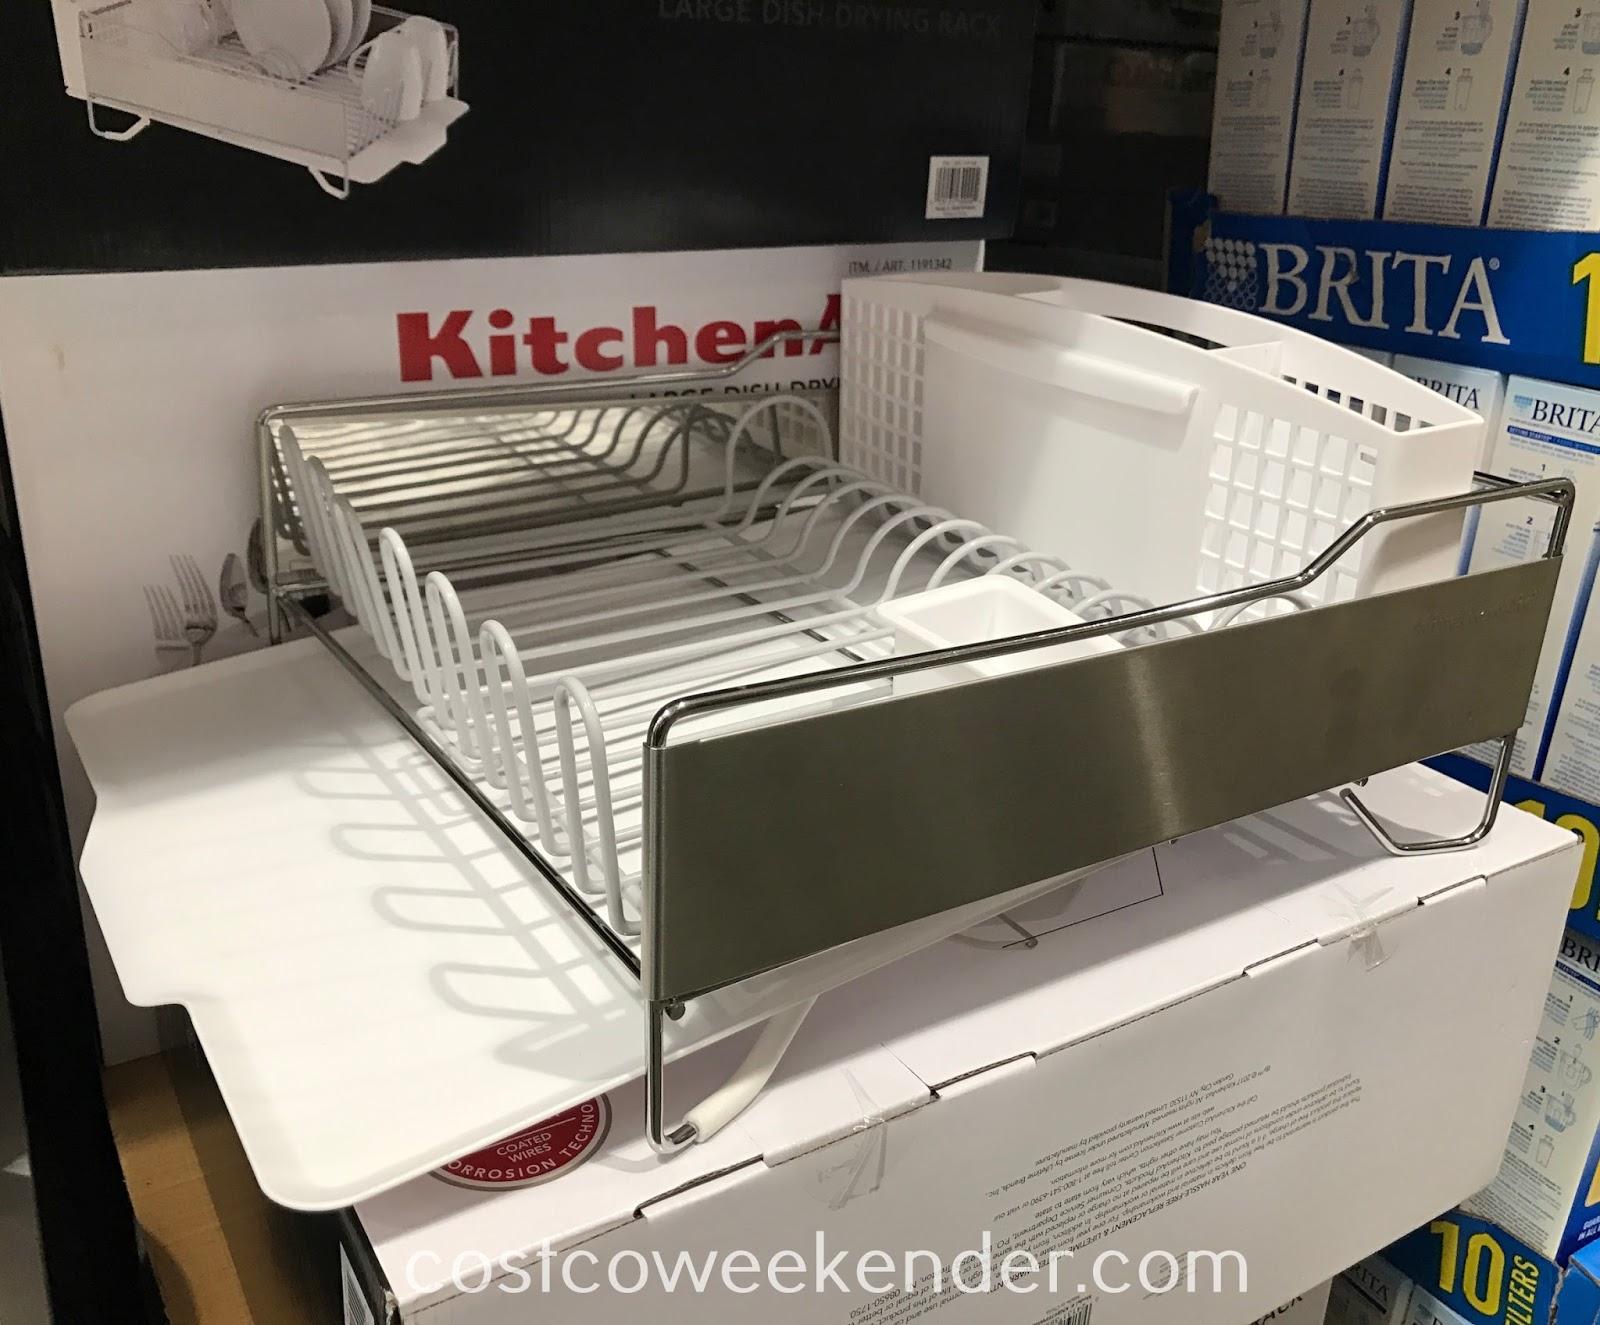 KitchenAid Large DishDrying Rack  Costco Weekender